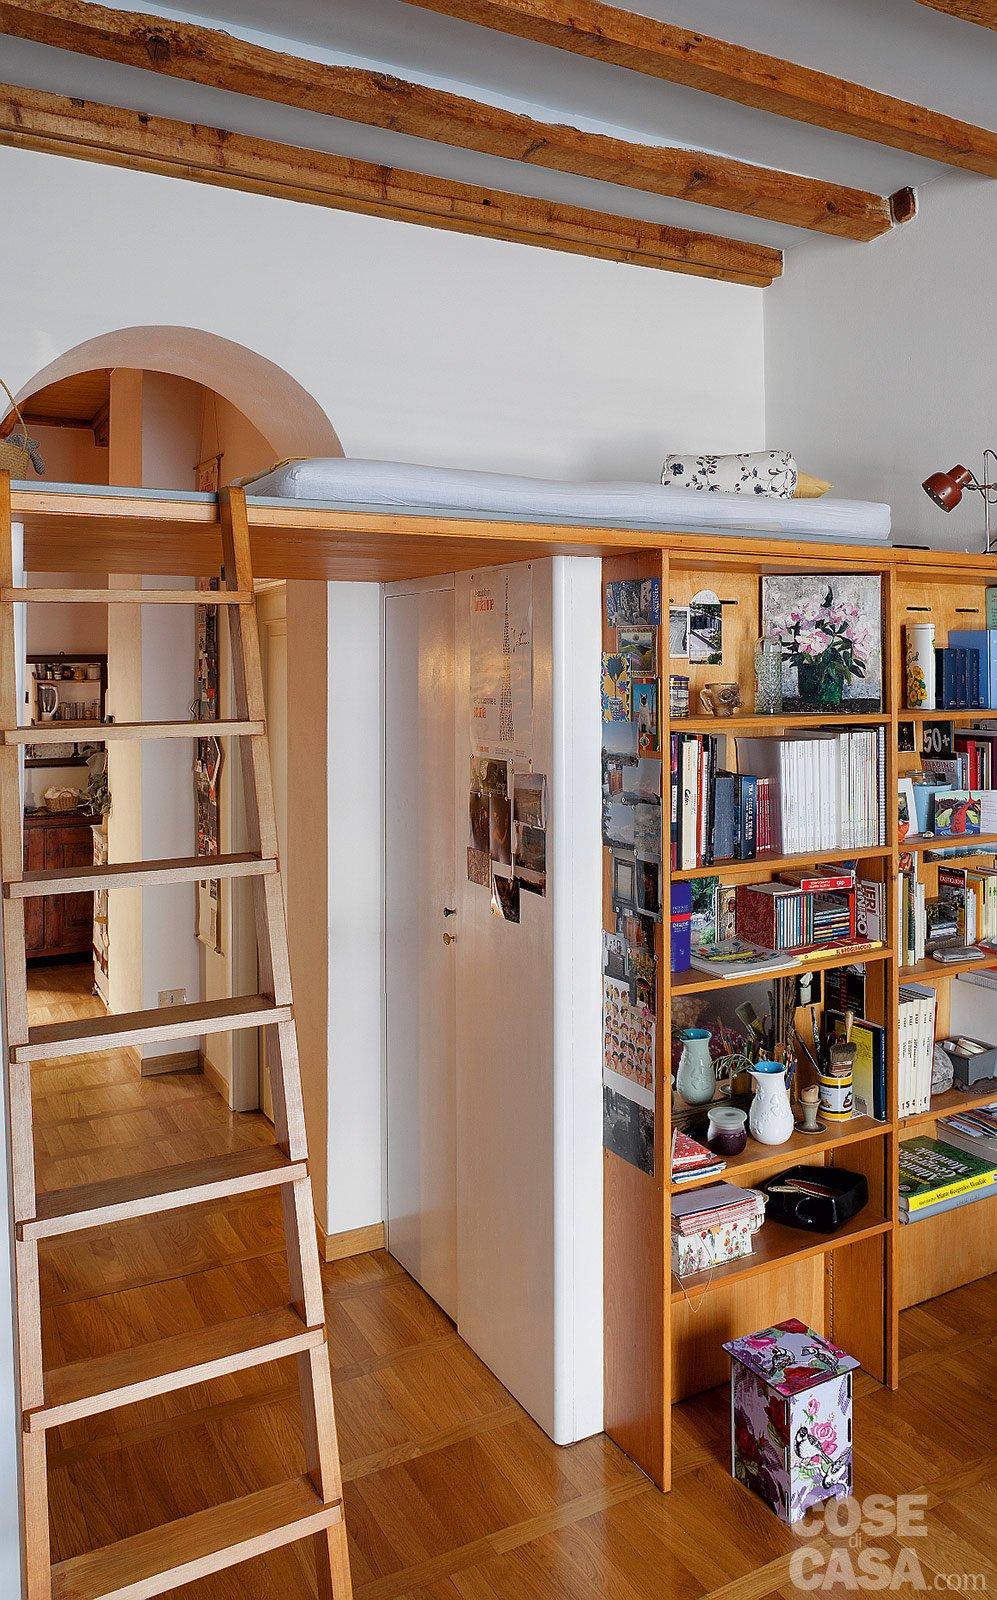 Bilocale di 40 mq una casa fai da te cose di casa for Arredare casa 120 mq